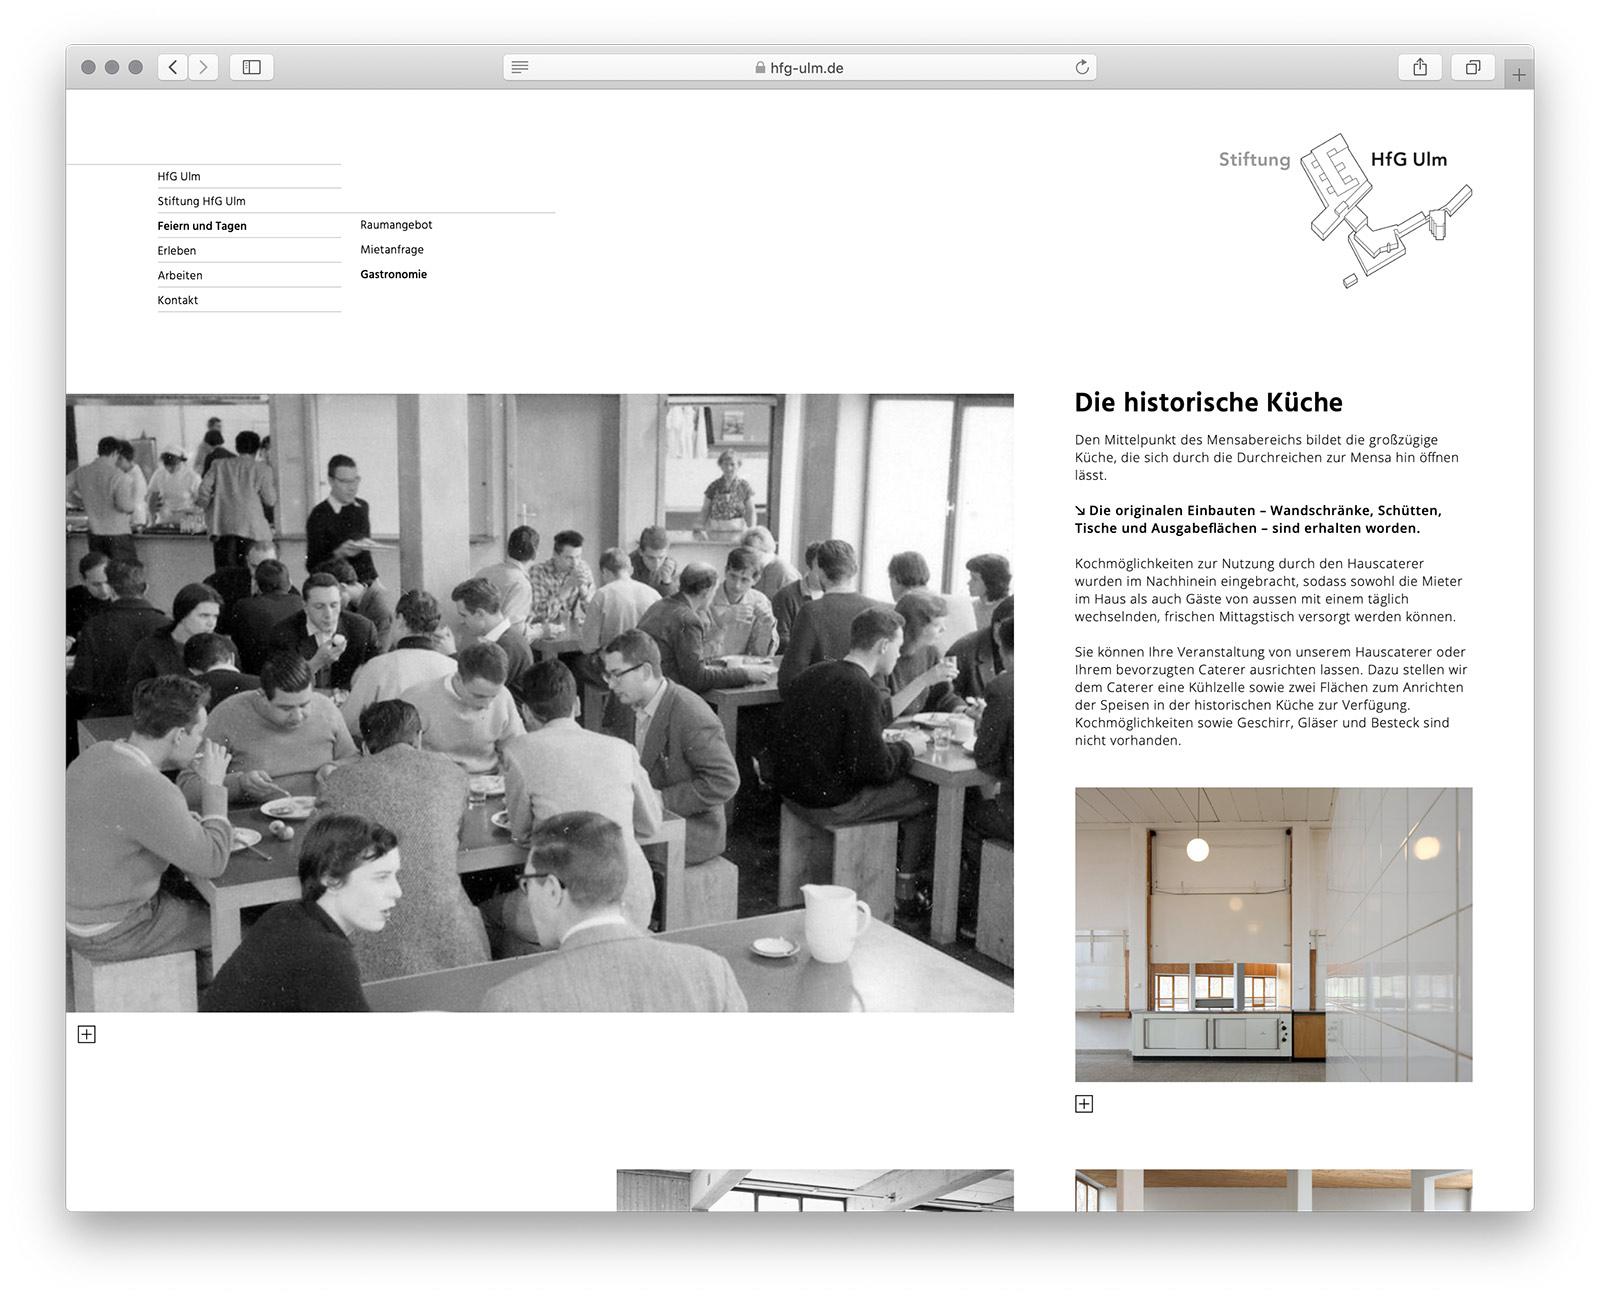 hfgwebsite4